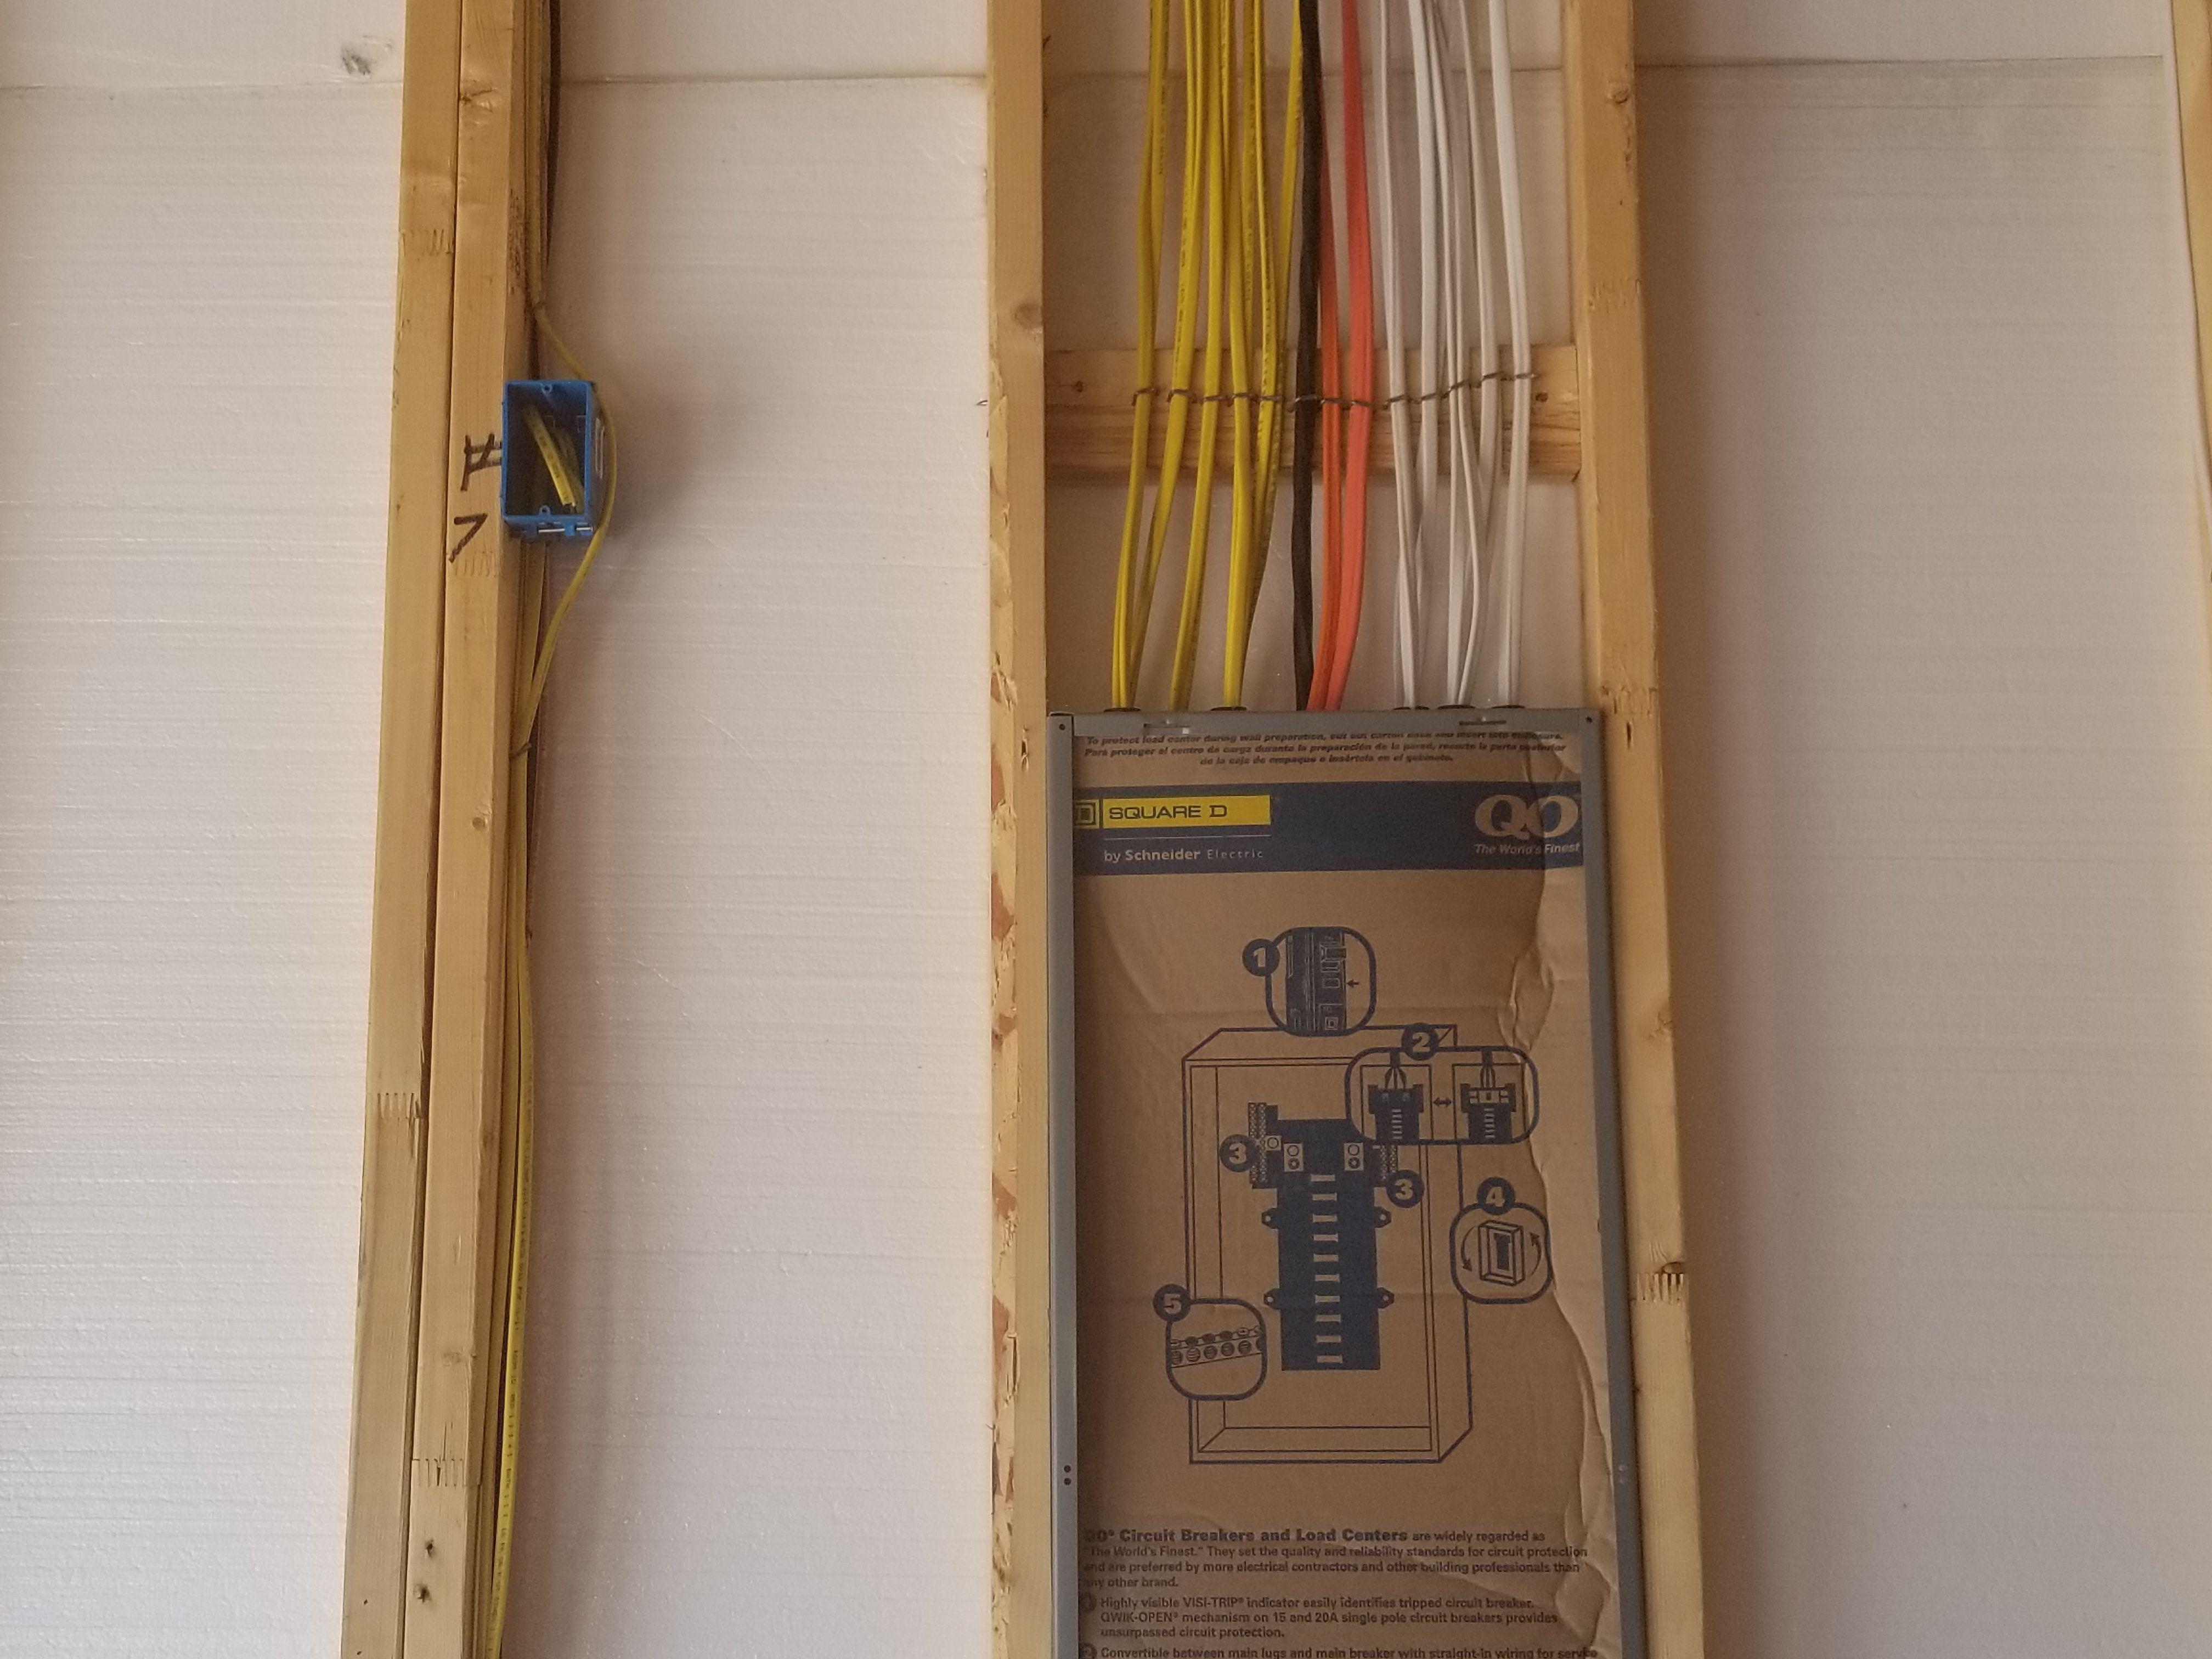 Freeman Construction Ready Electrical New Panel Trippedcircuitbreakerpaneljpg